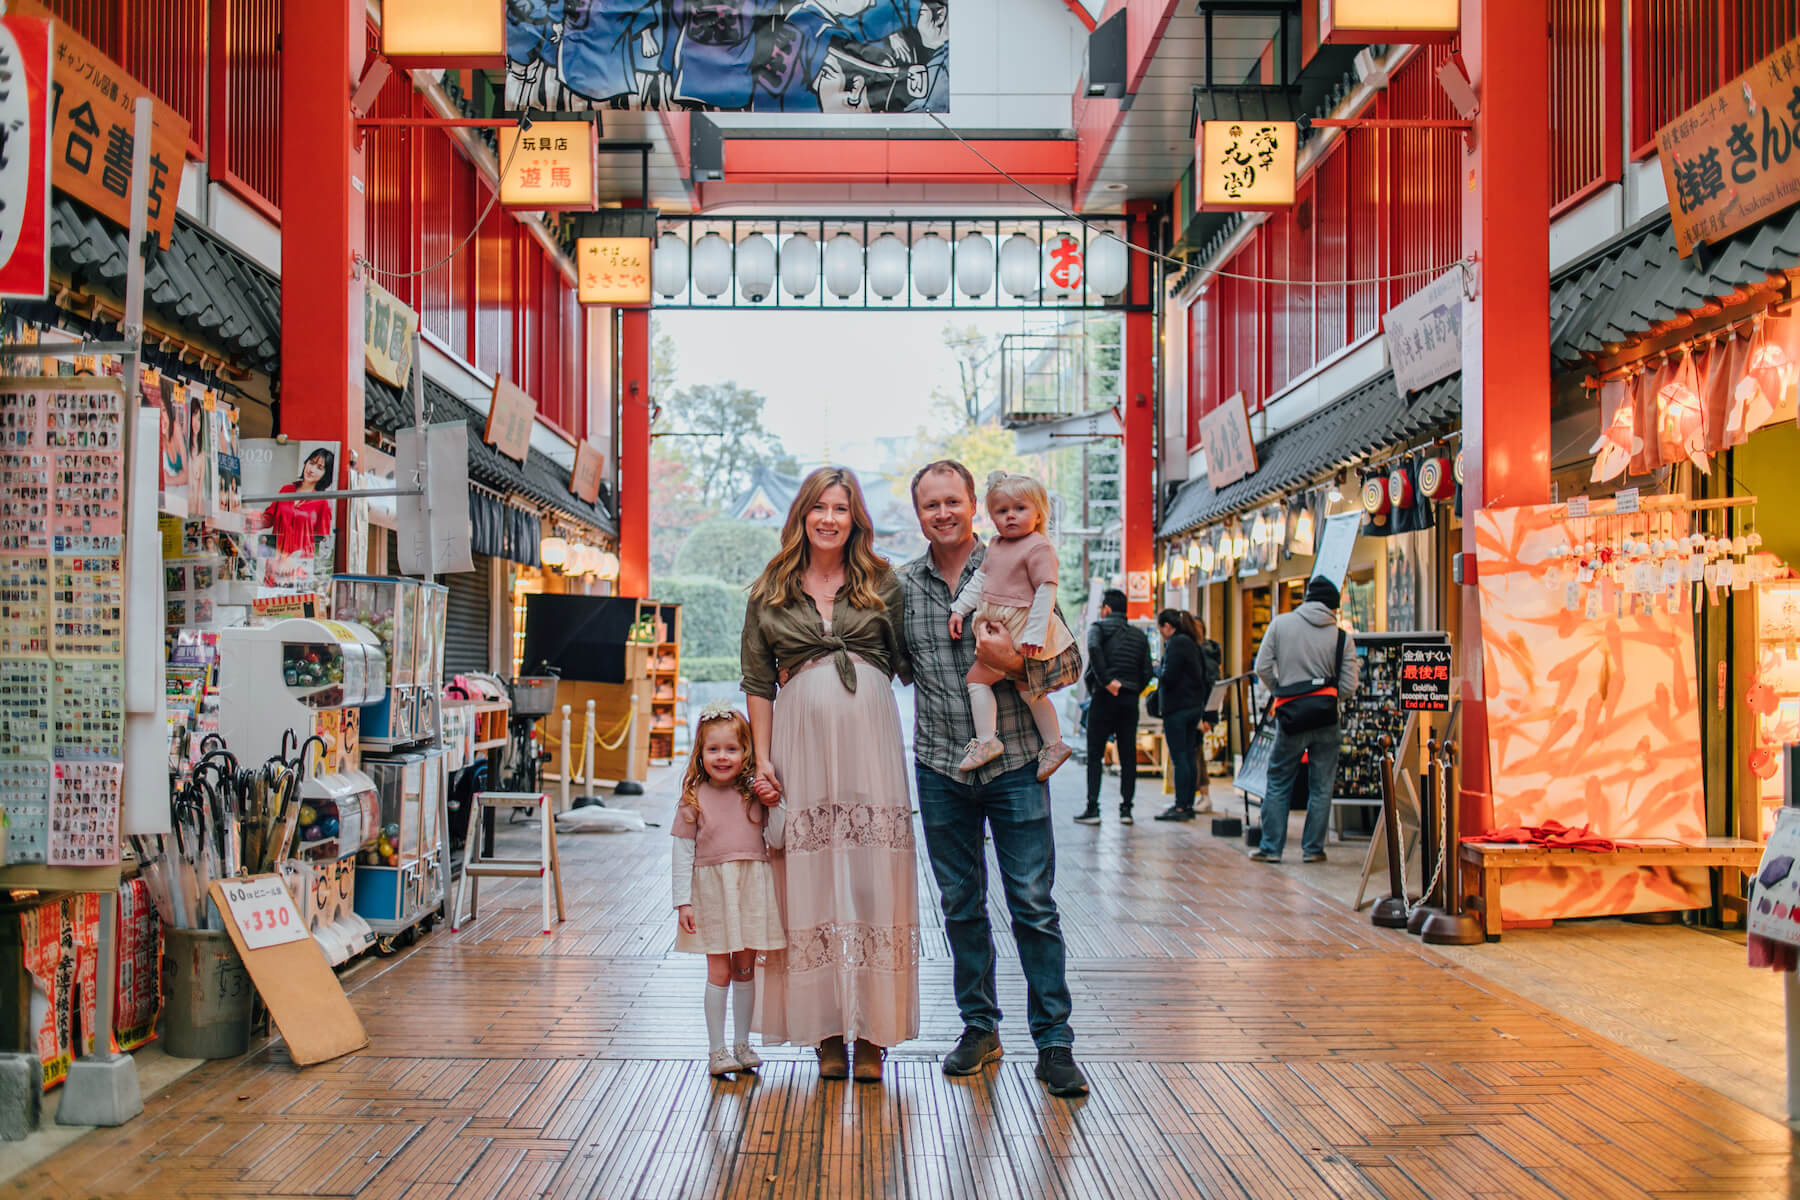 Family of 4 in Tokyo Japan